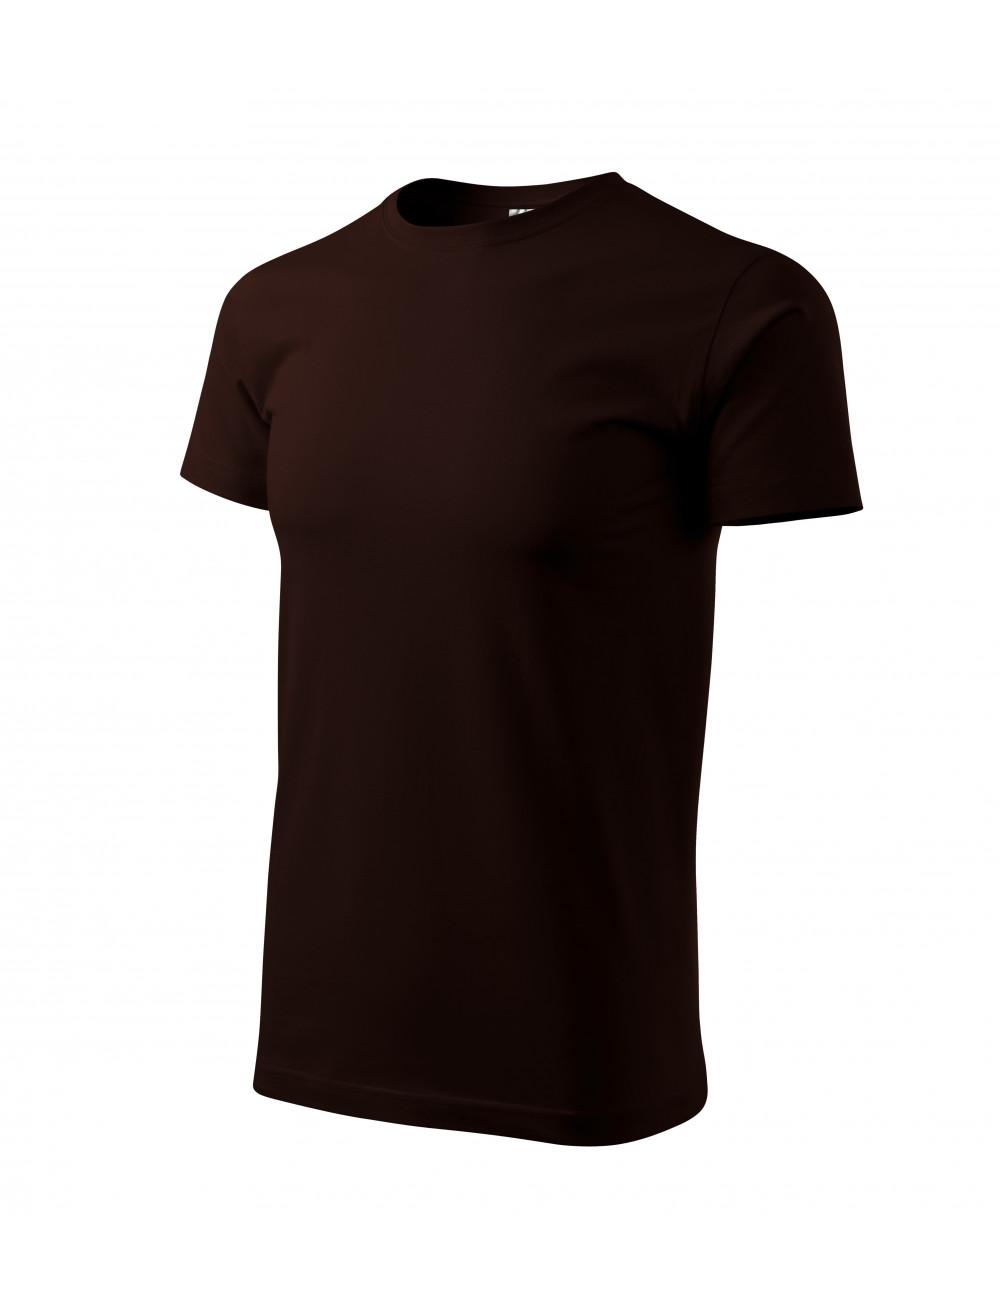 Adler MALFINI Koszulka unisex Heavy New 137 kawowy